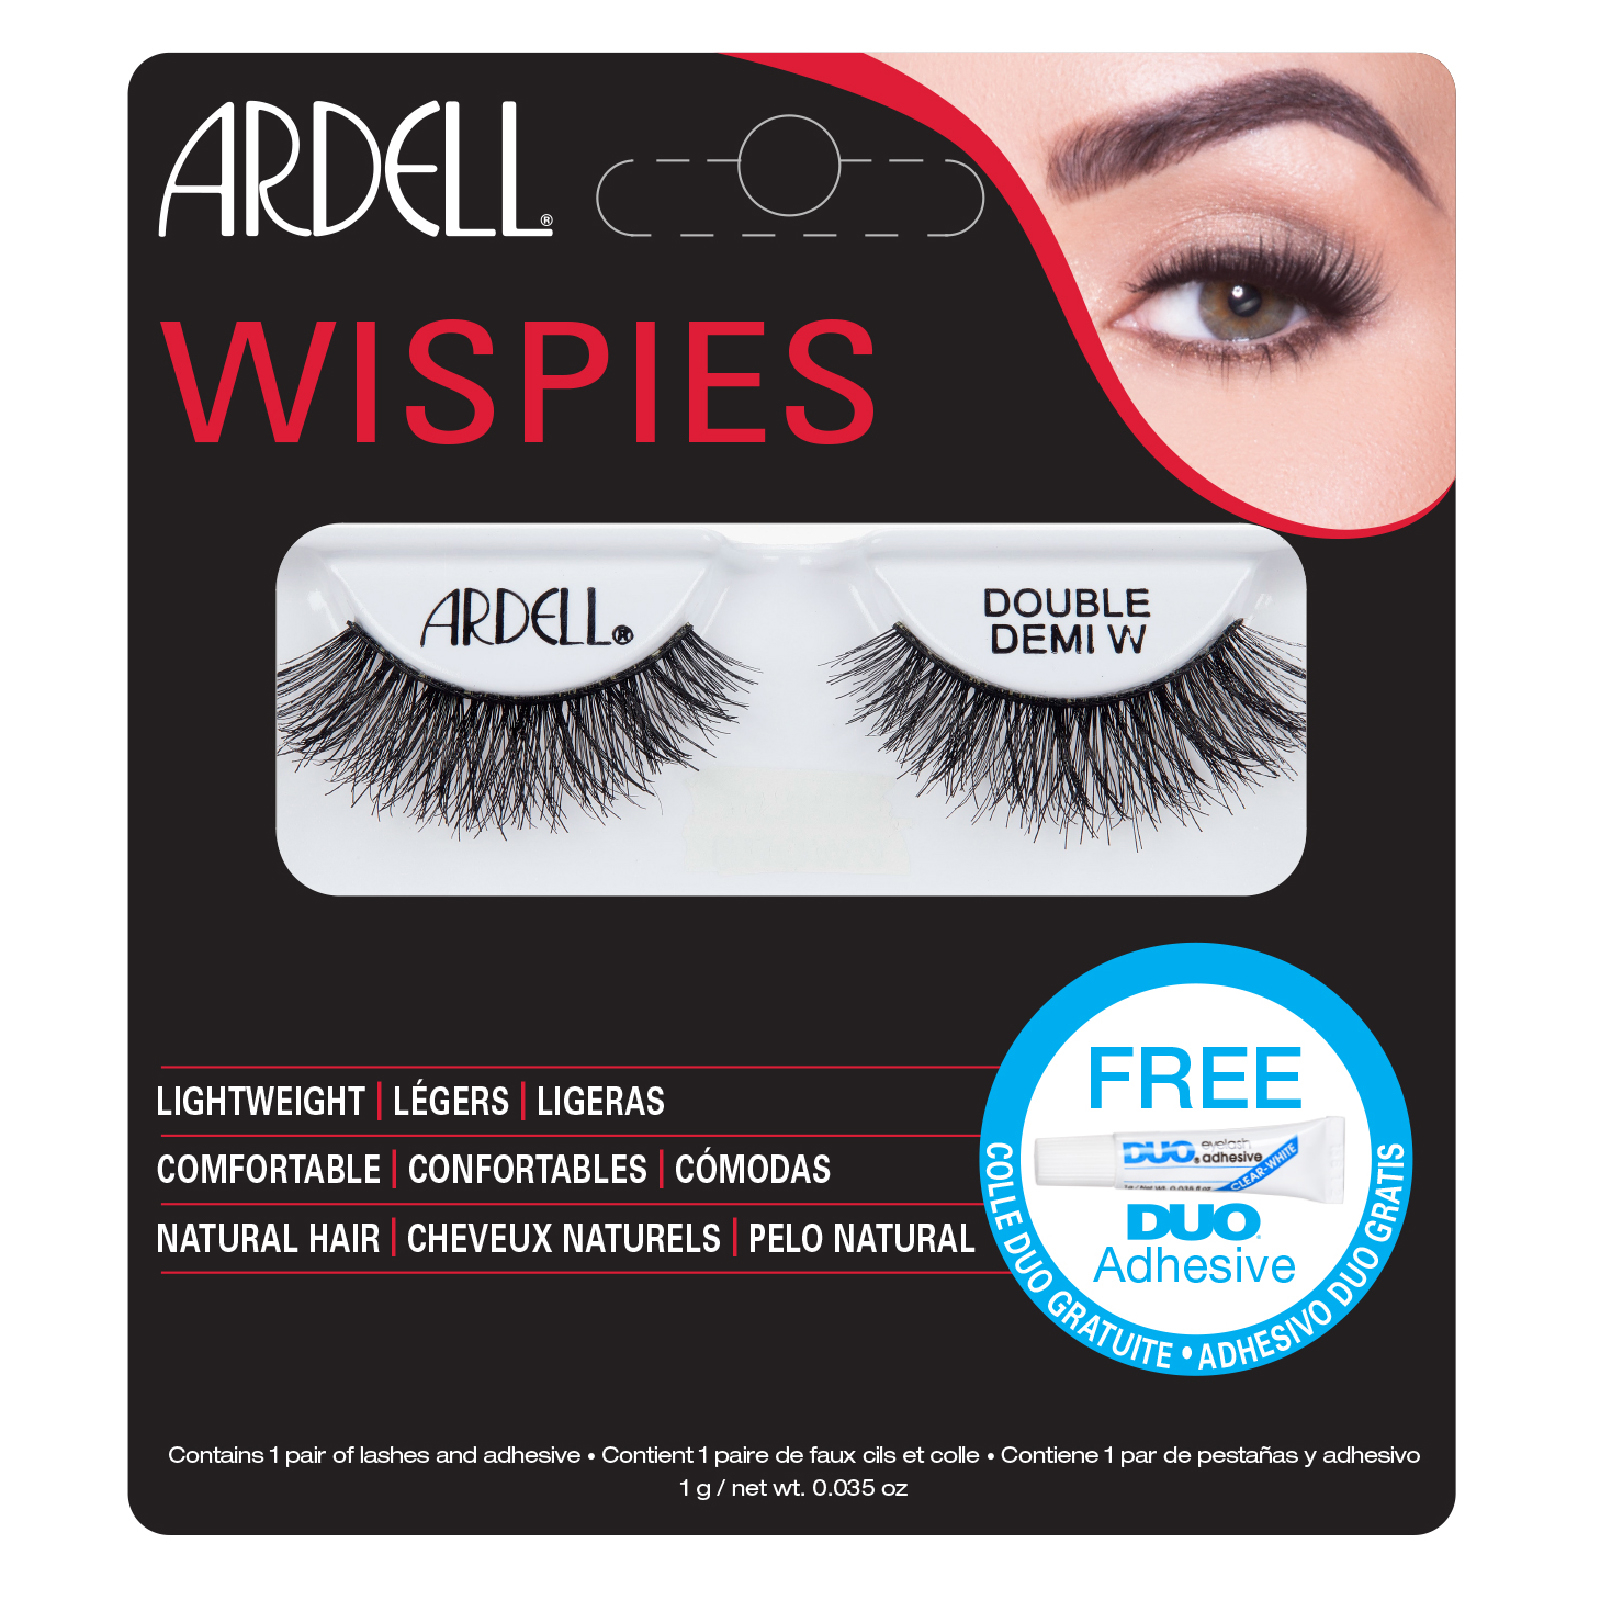 Ardell Double Up Demi Wispies False Eyelashes Black Free Us Shipping Lookfantastic